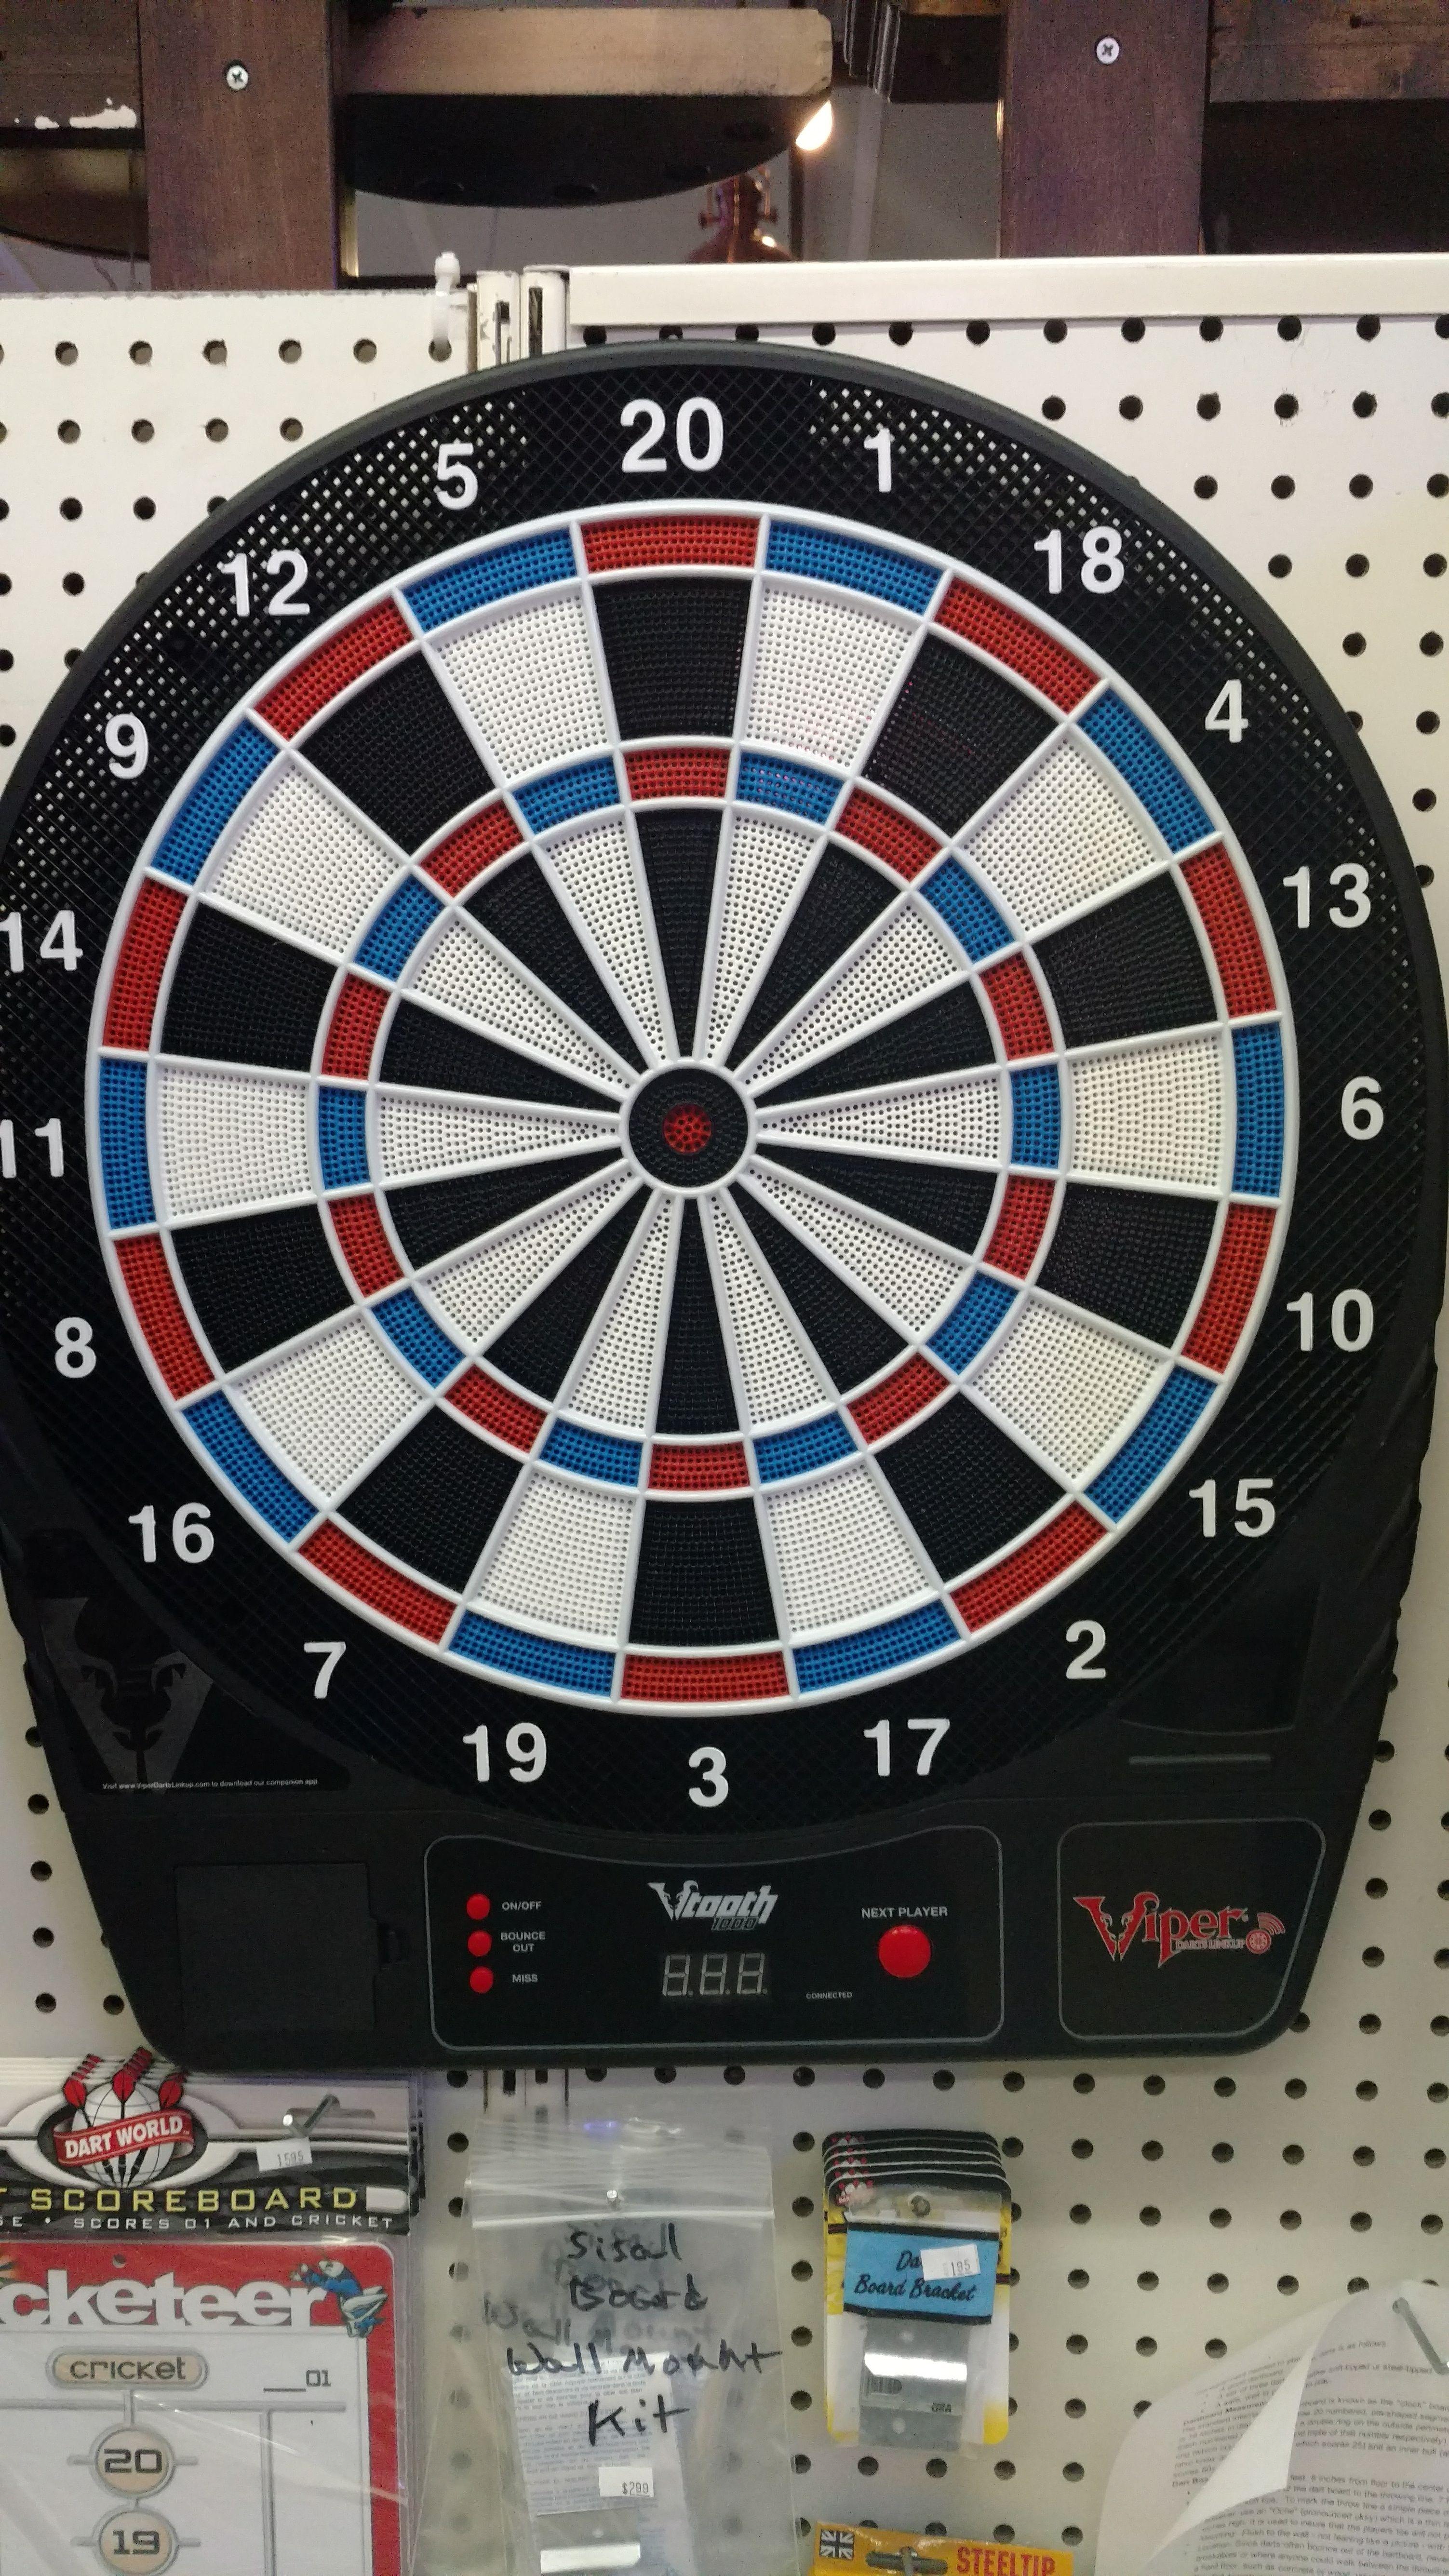 Viper VTooth 1000 Blue Tooth Enabled darts kdamusement